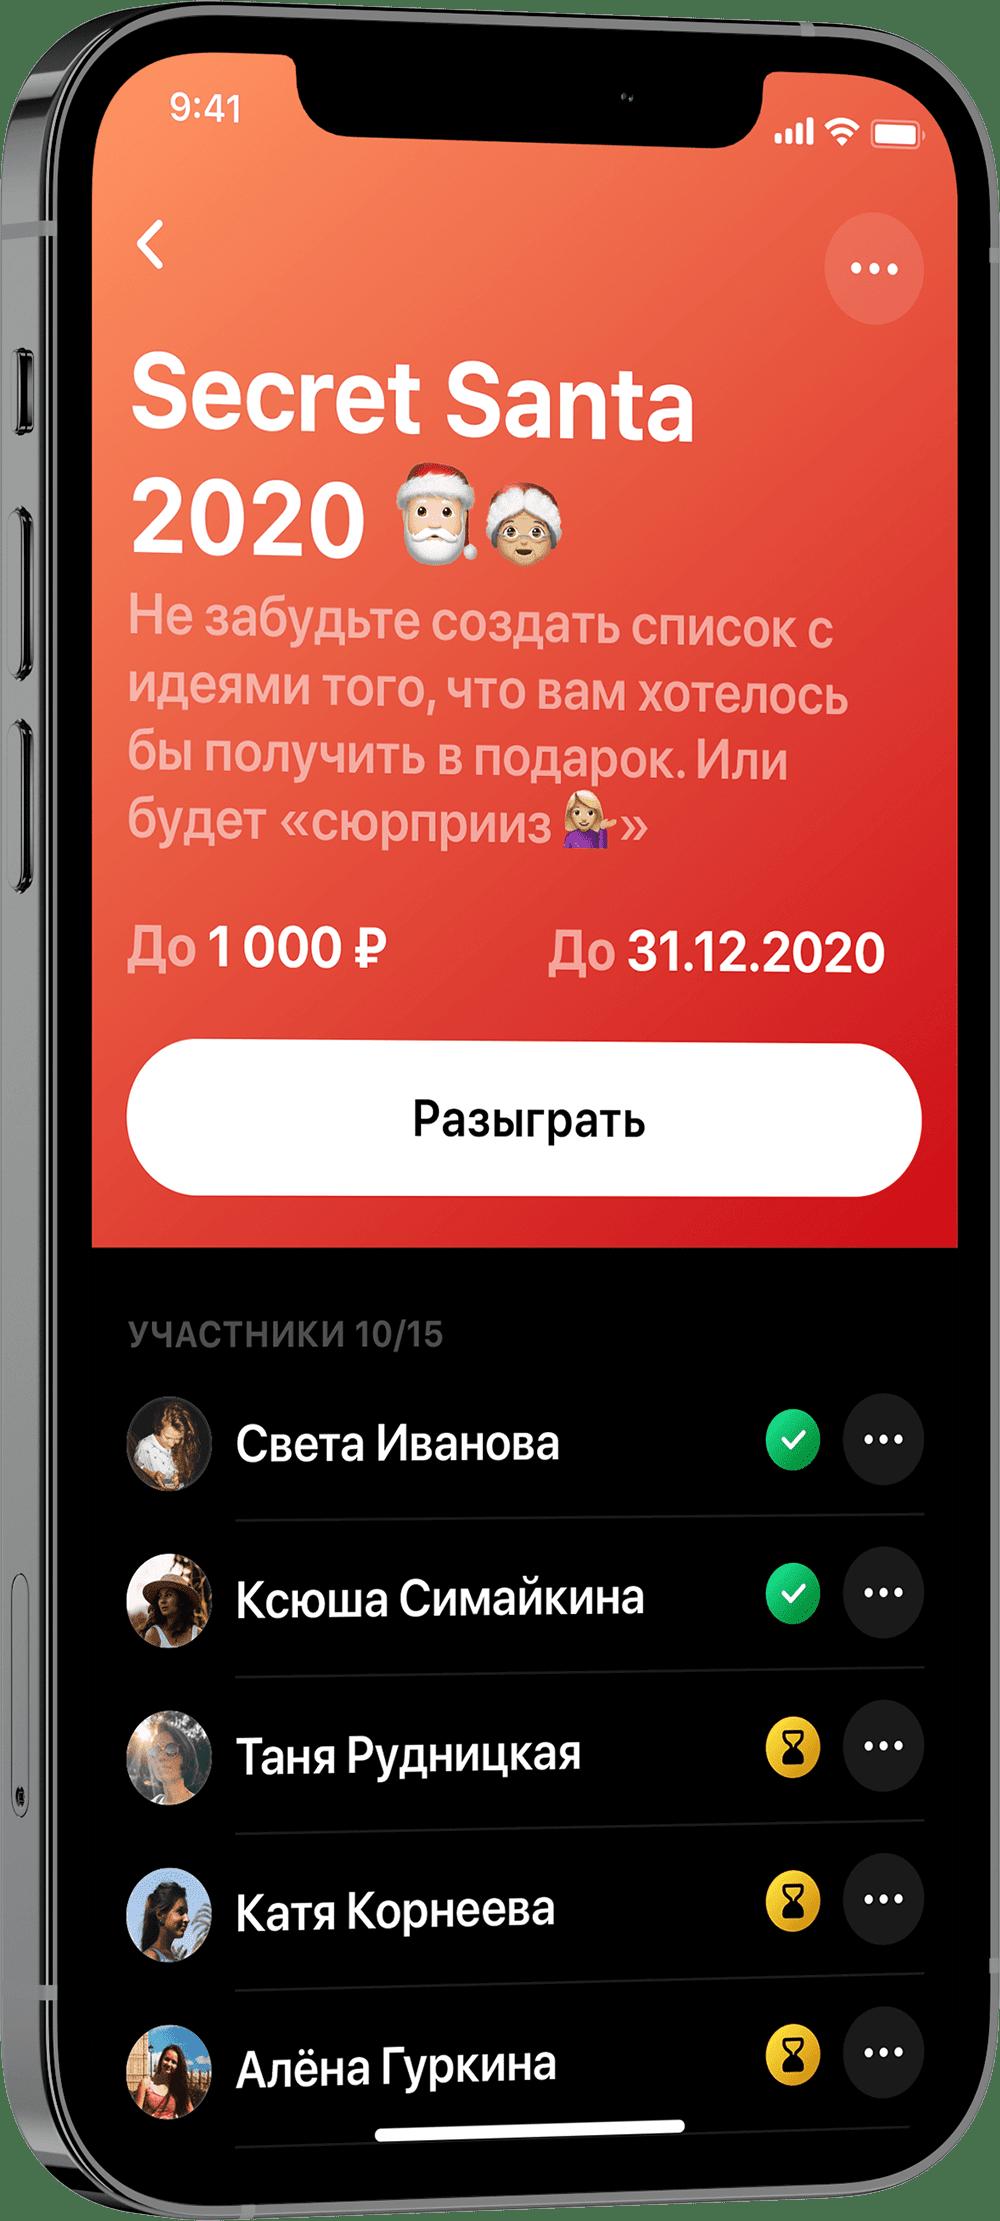 Ohmywishes iOS, Wishlist, Вишлист, Идеи подарков, Тайный санта, Secret Santa, Wish Ideas